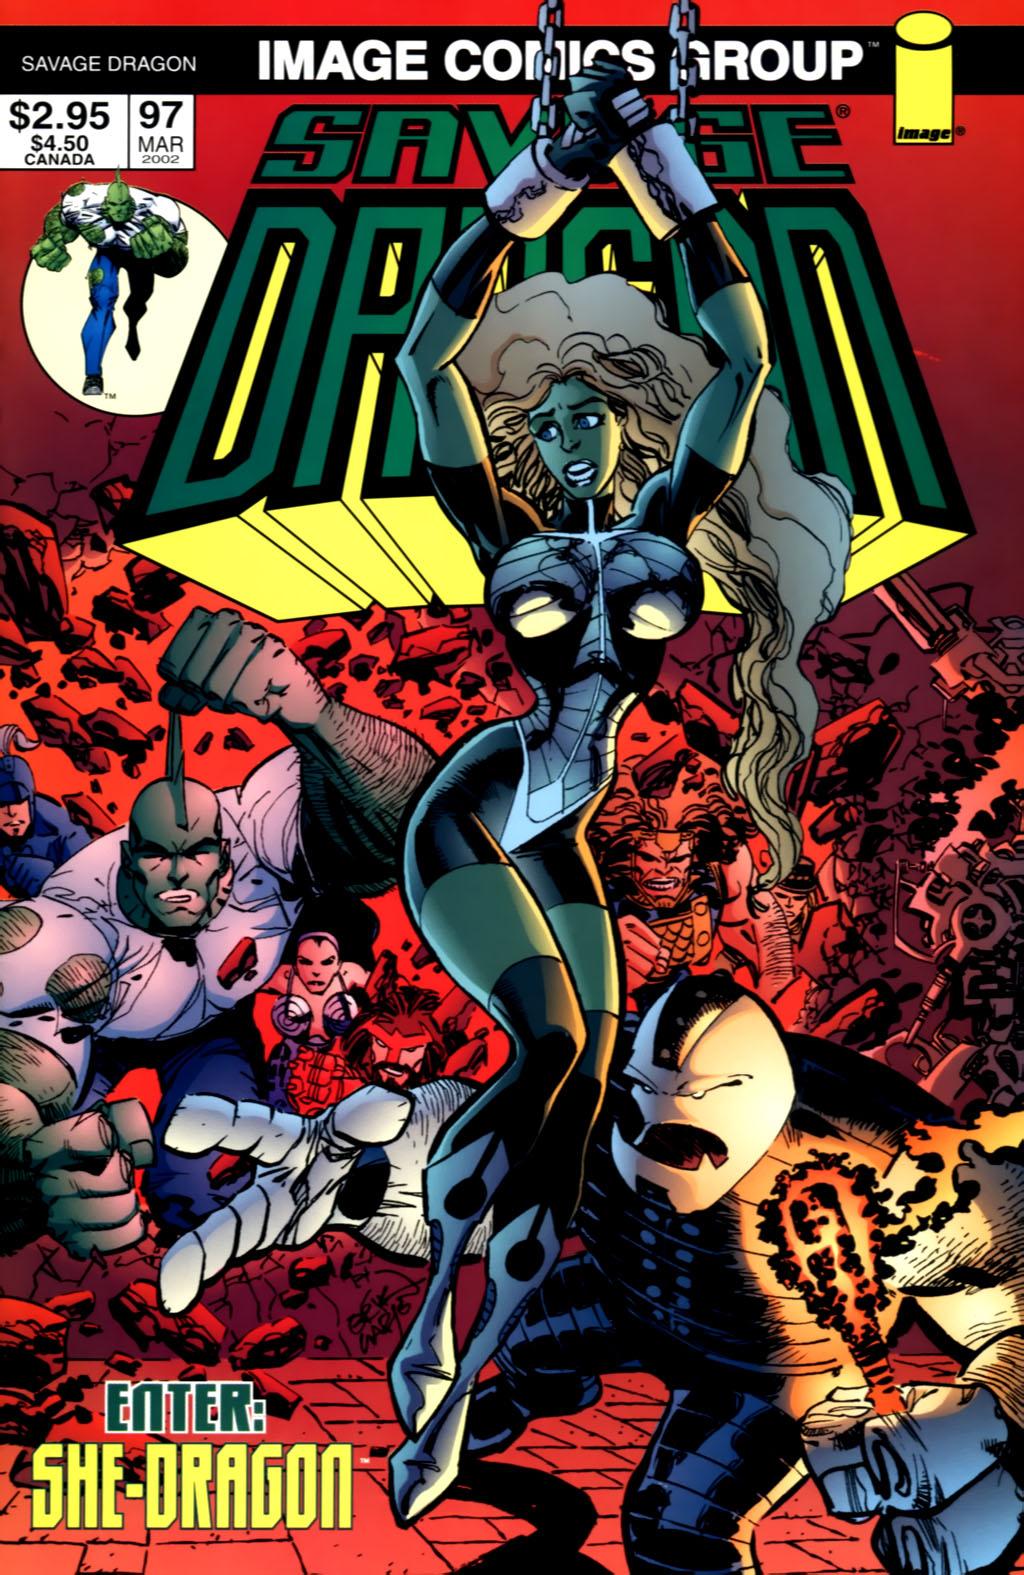 The Savage Dragon (1993) Issue #97 #100 - English 1